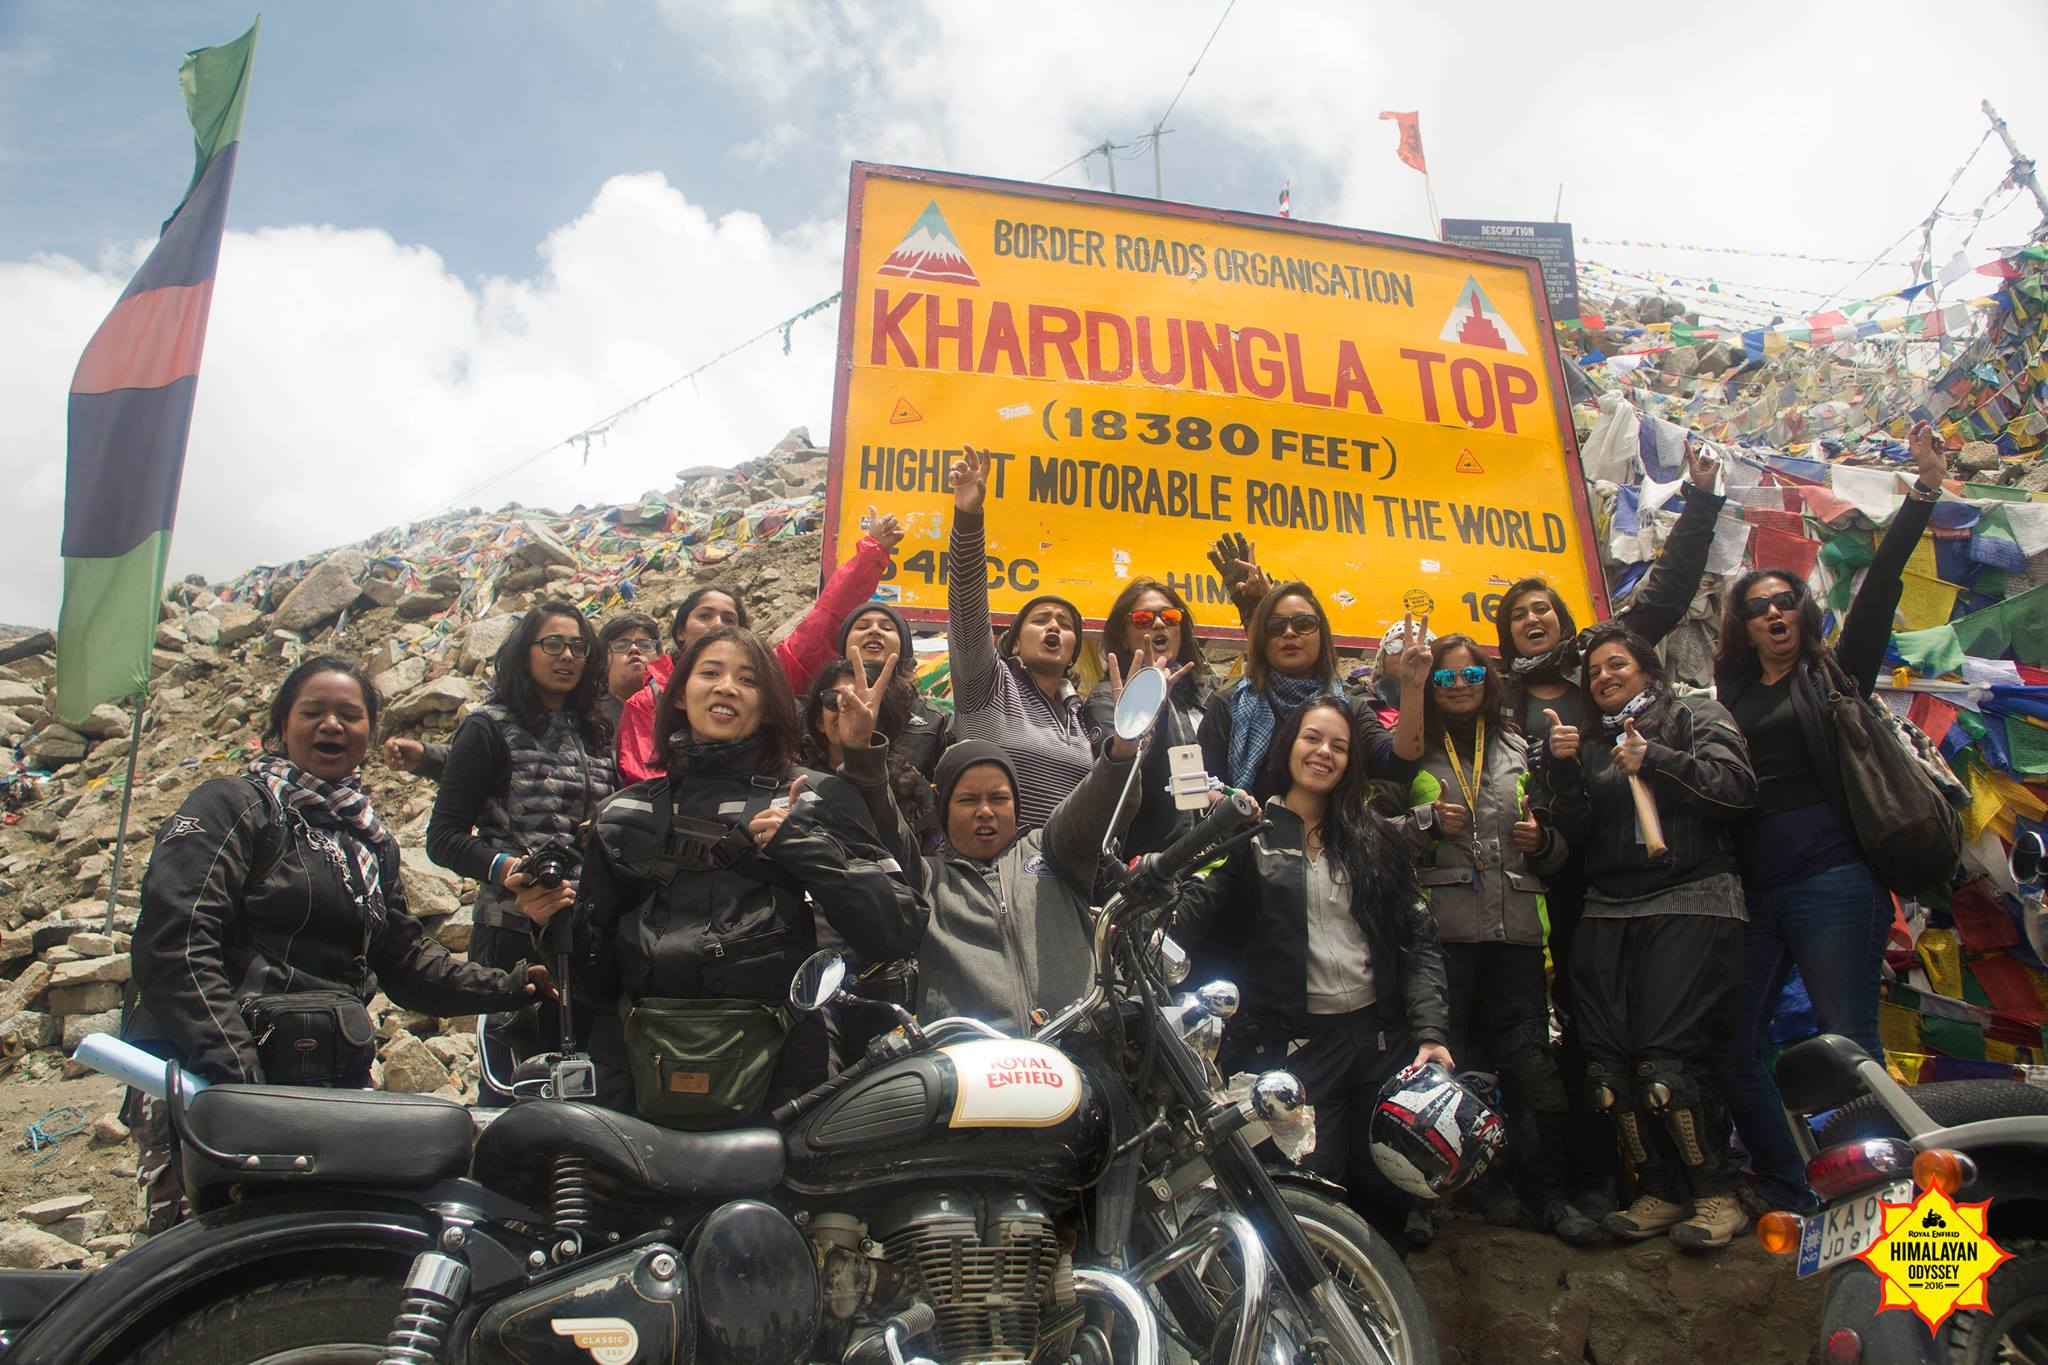 The highest motorable road in the world- Khardungla!